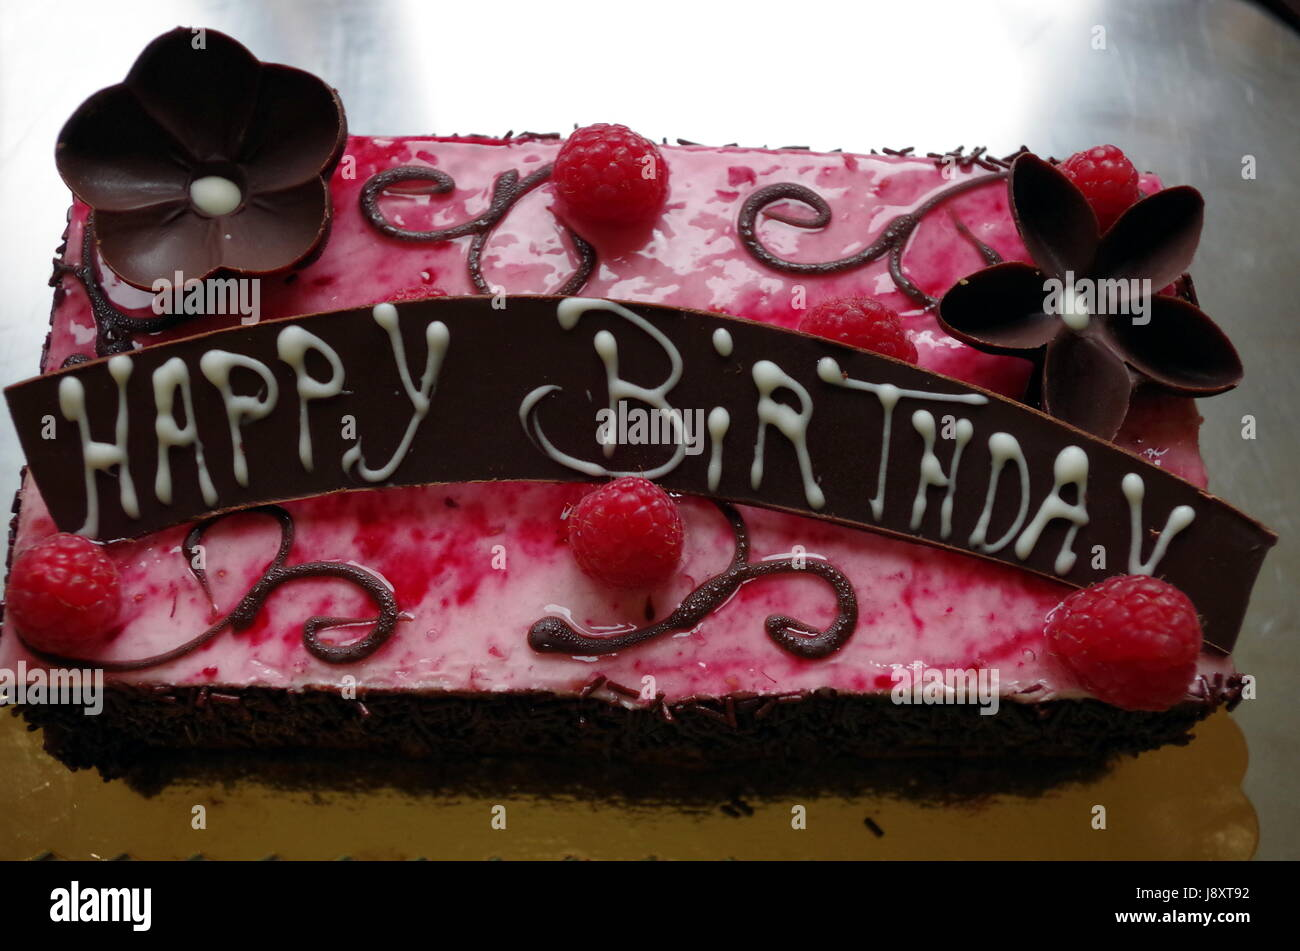 Terrific Chocolate Birthday Cake With Chocolate Flower And Raspberry Stock Personalised Birthday Cards Arneslily Jamesorg